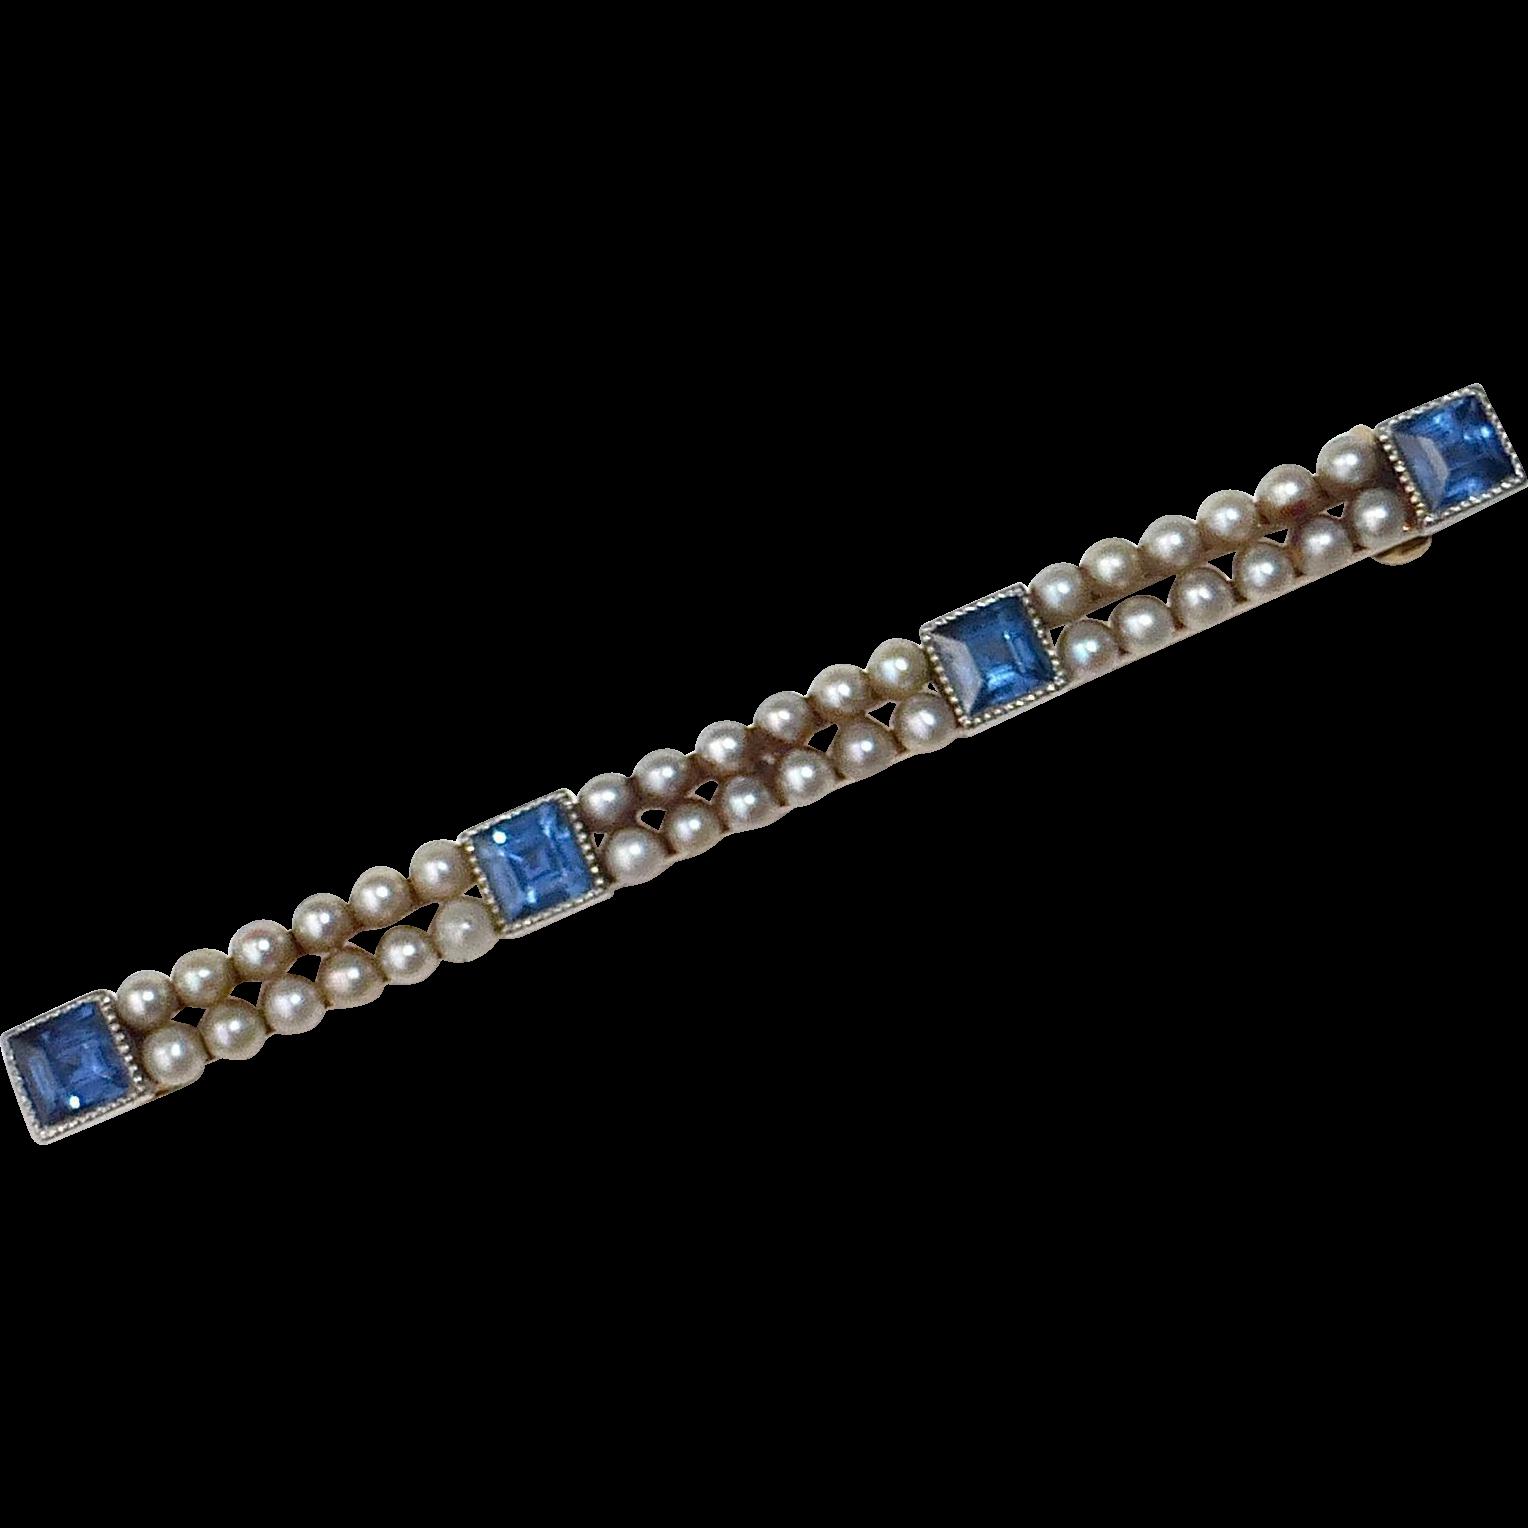 Antique Edwardian 14k Sapphire & Pearl Bar Pin c1910